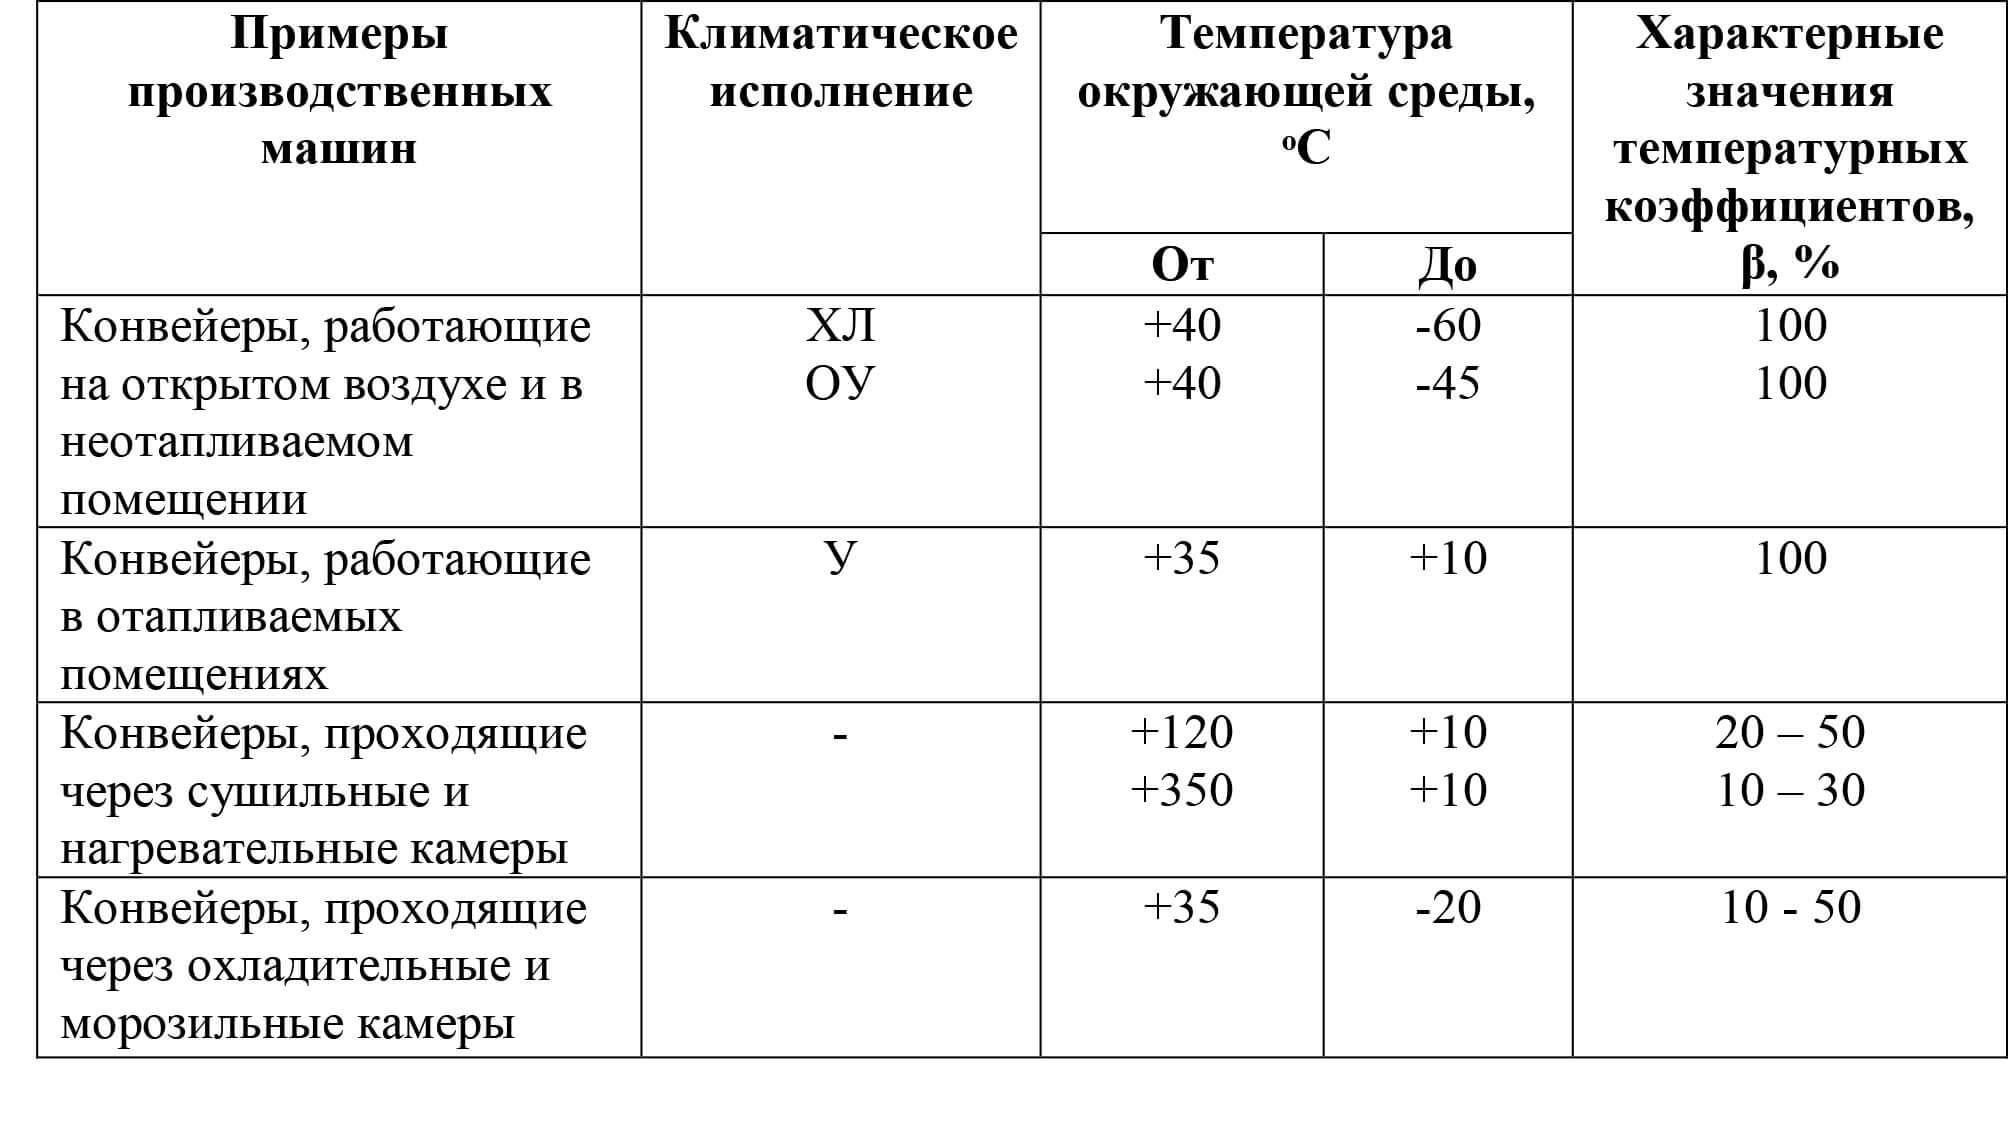 Характеристика температурных условий